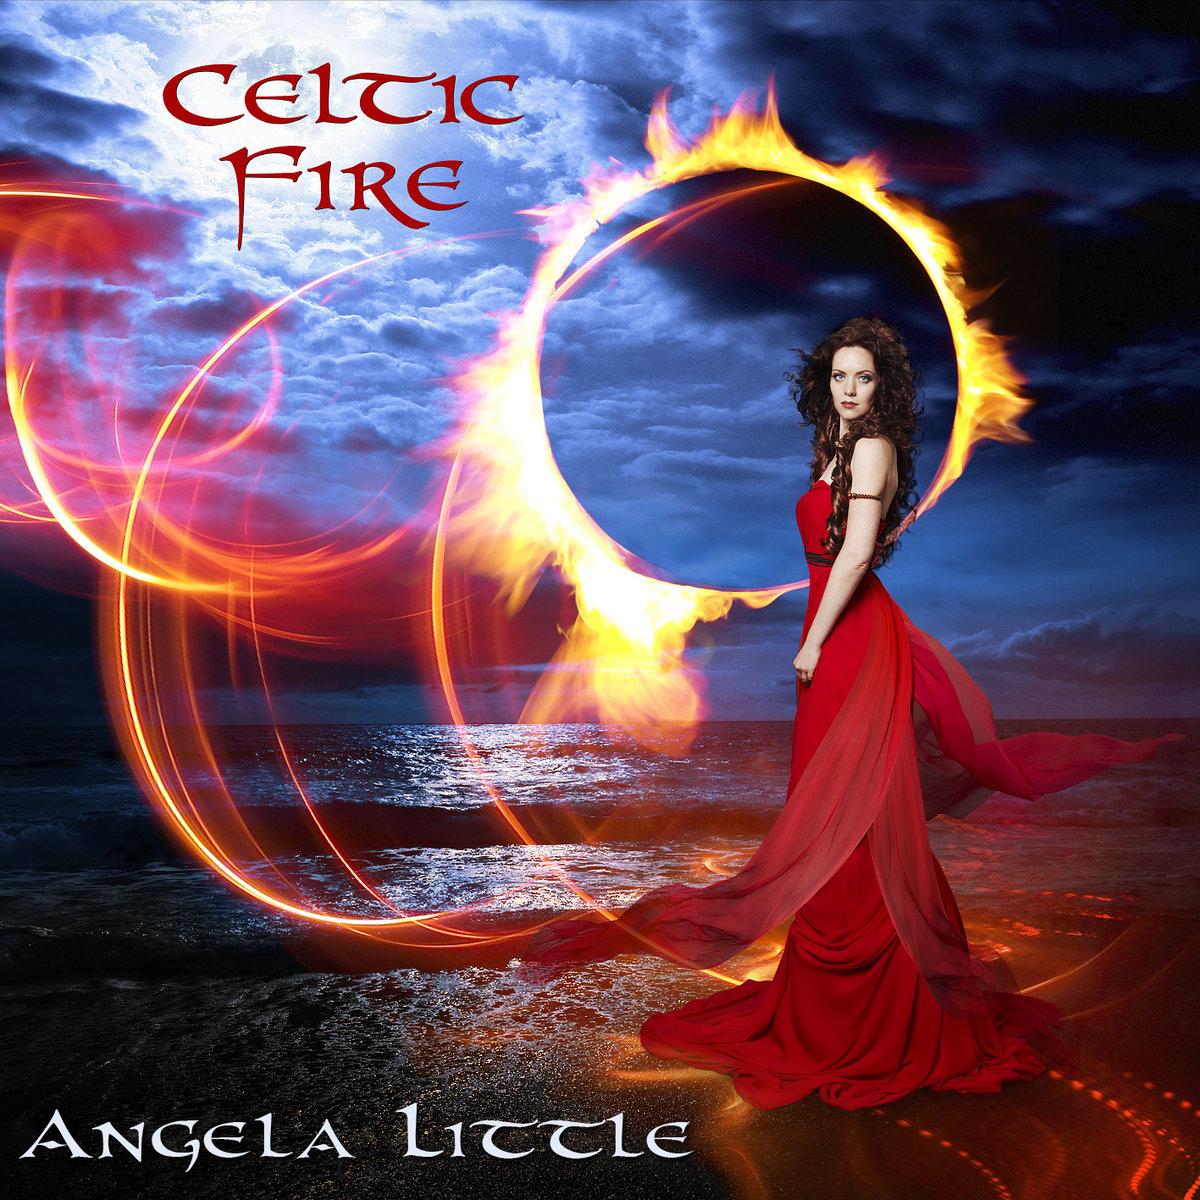 Celtic Fire | Angela Little